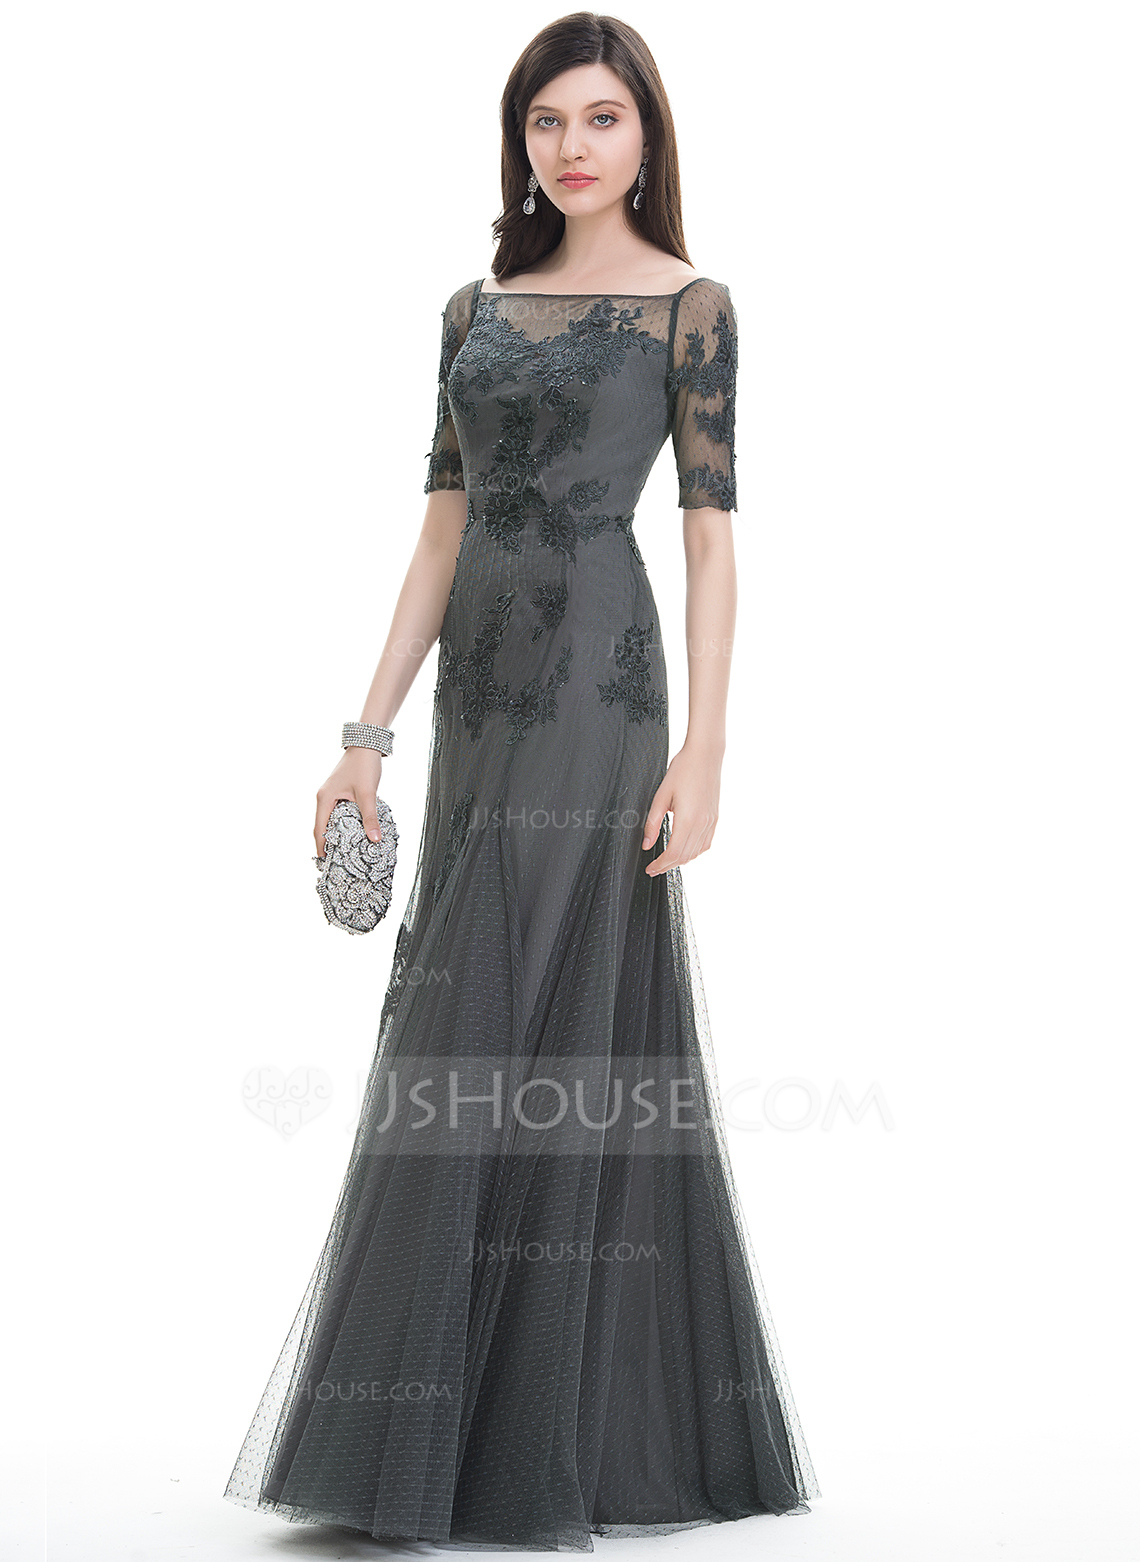 jjshouse.com evening dresses photo - 1